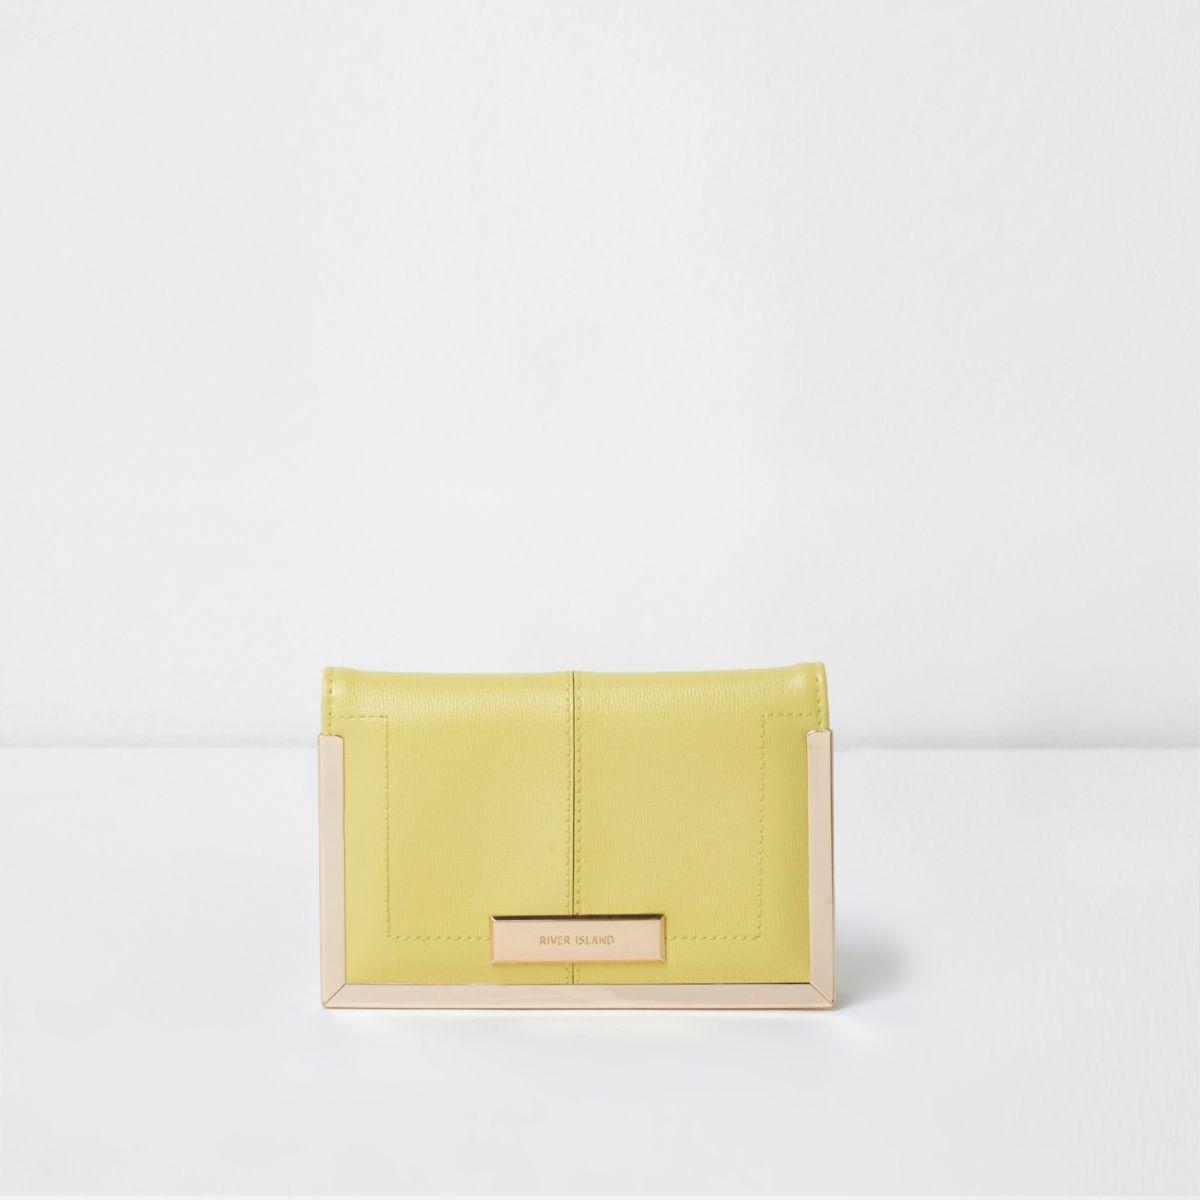 Light yellow and gold tone passport case